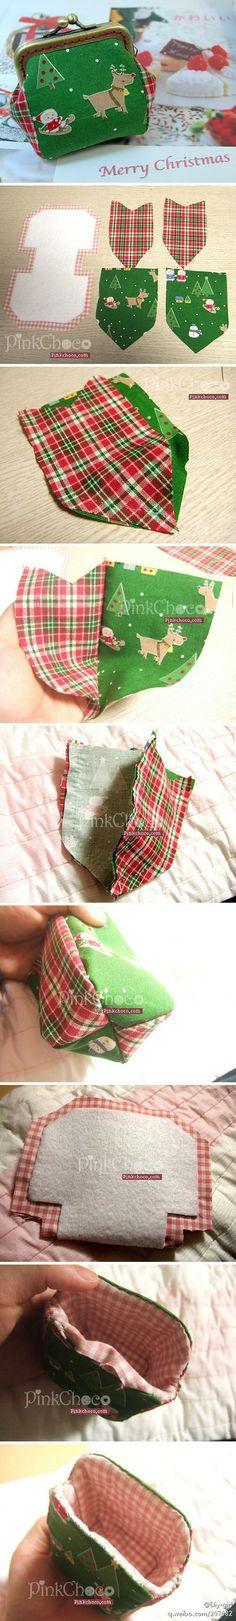 #PINKCOCO教程#圣诞可爱金口包...…_来自-跳蚤-的图片分享-堆糖网